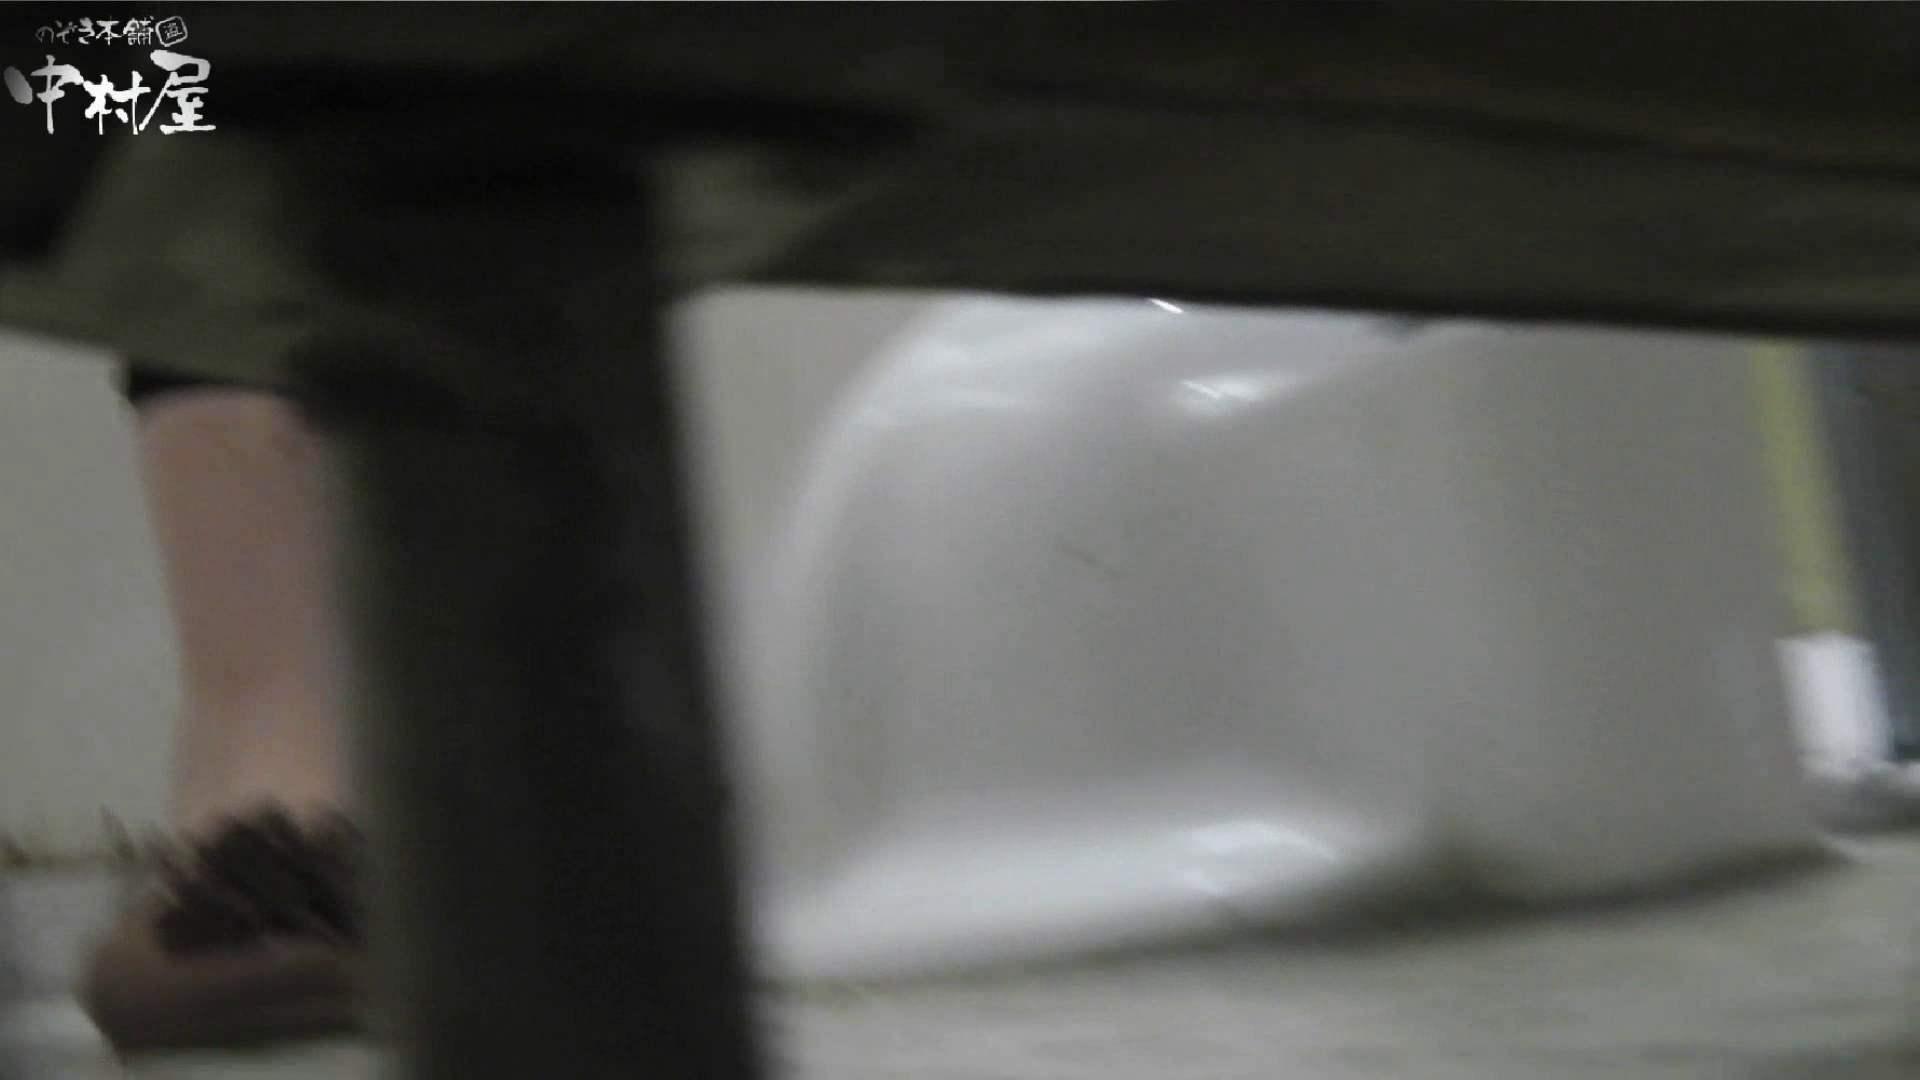 vol.49 命がけ潜伏洗面所! ポニテたんのソフトなブツ・推定180g 潜入シリーズ  74Pix 7